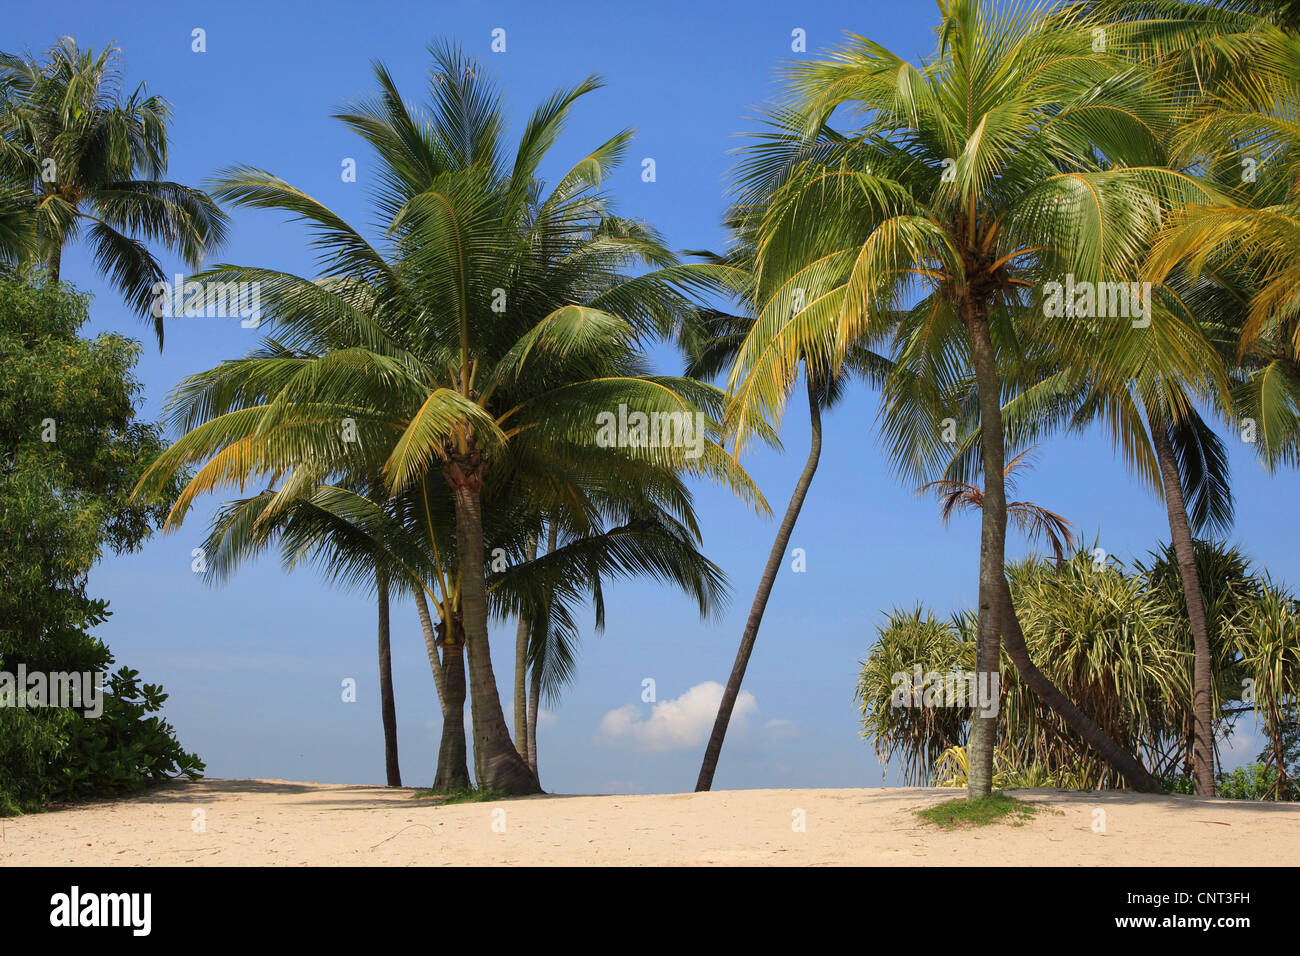 Kokospalme (Cocos Nucifera), Palmen am Strand, Singapur Stockbild